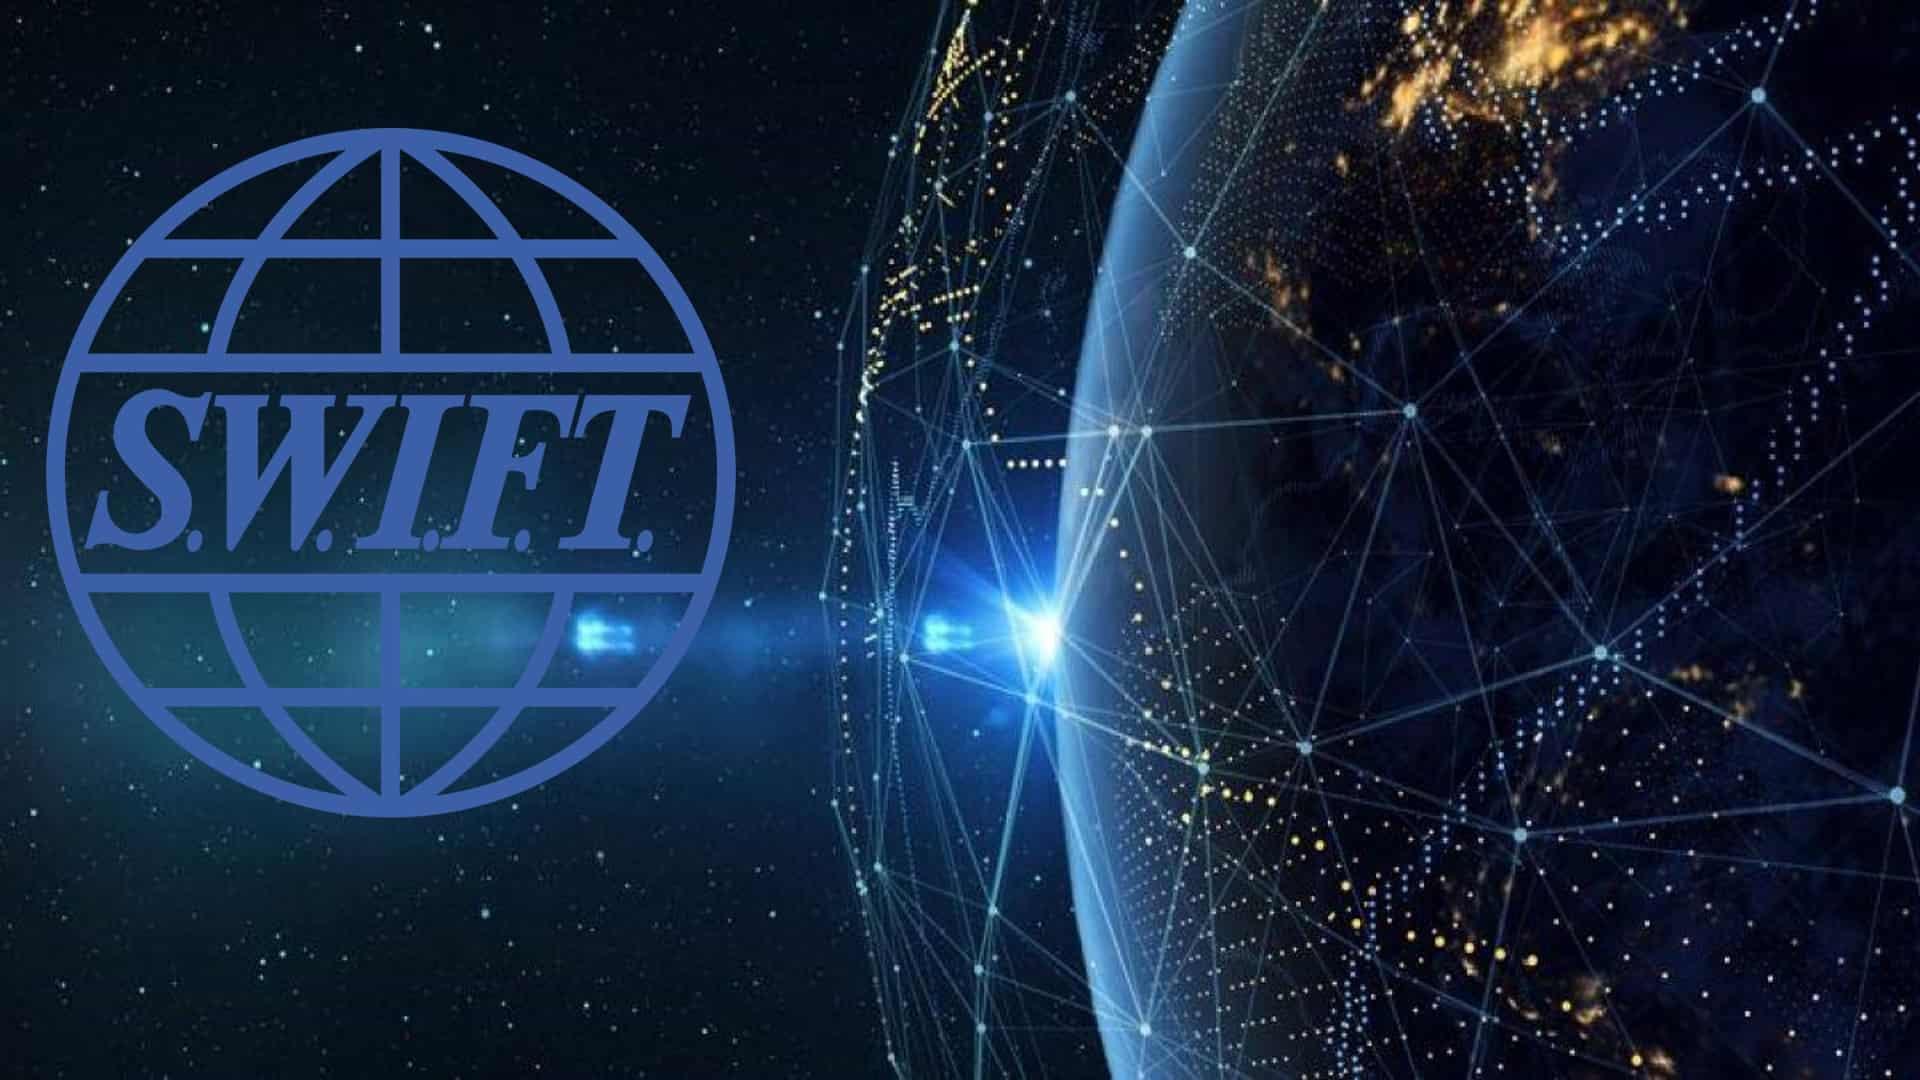 SWIFT รุกล้ำตลาดของ Ripple โดยนำเสนอบริการการชำระเงินข้ามพรมแดนต้นทุนต่ำ